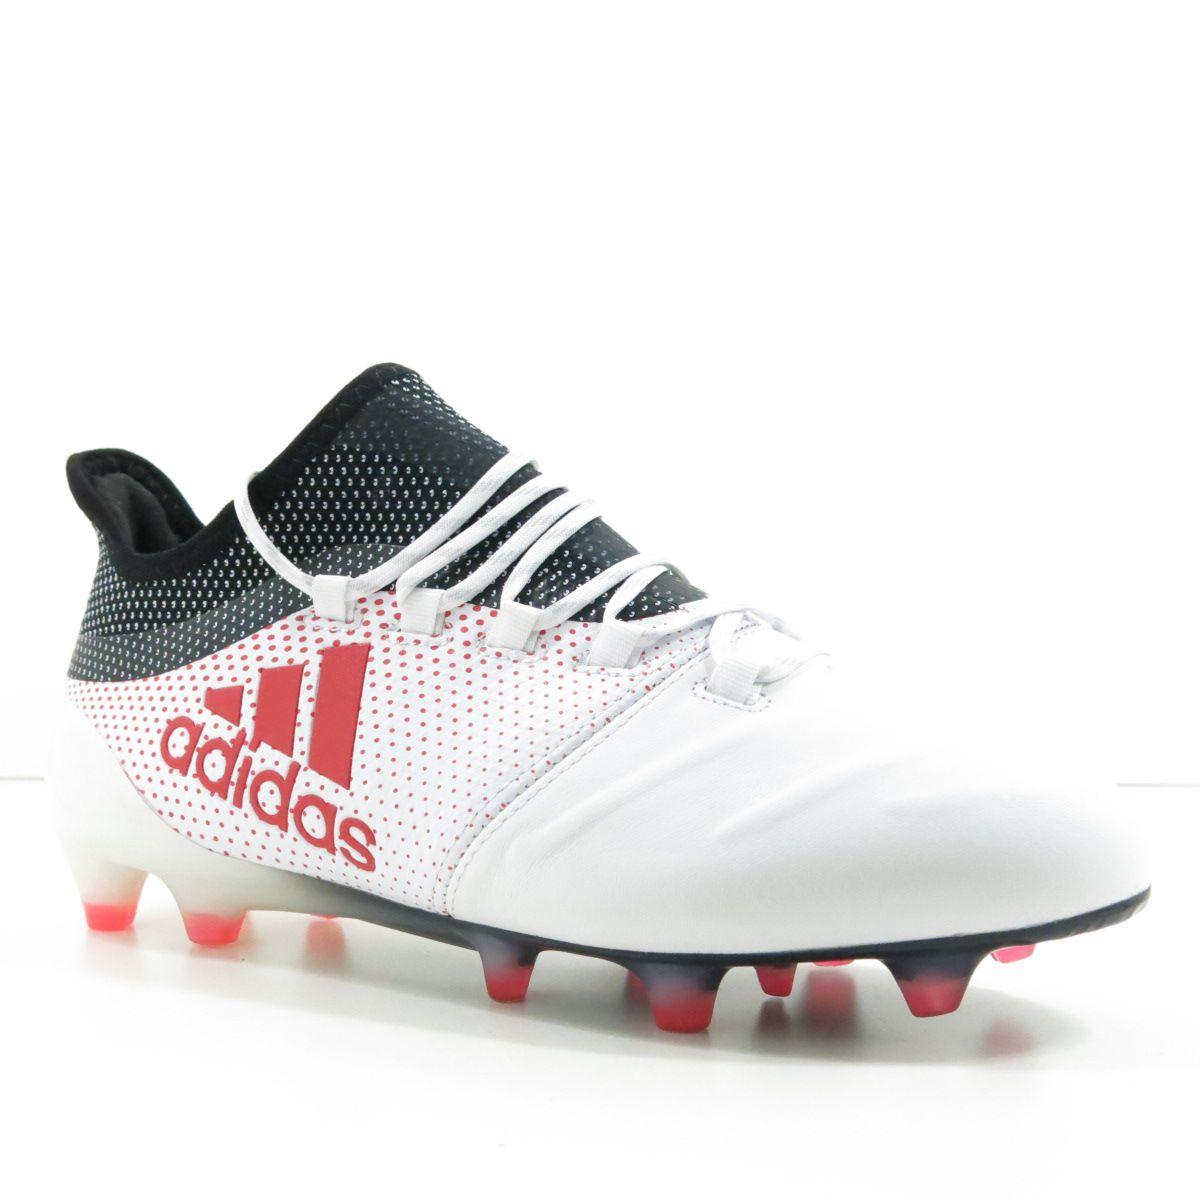 Chuteira Adidas X 17.1 FG Elite - Couro de Canguru